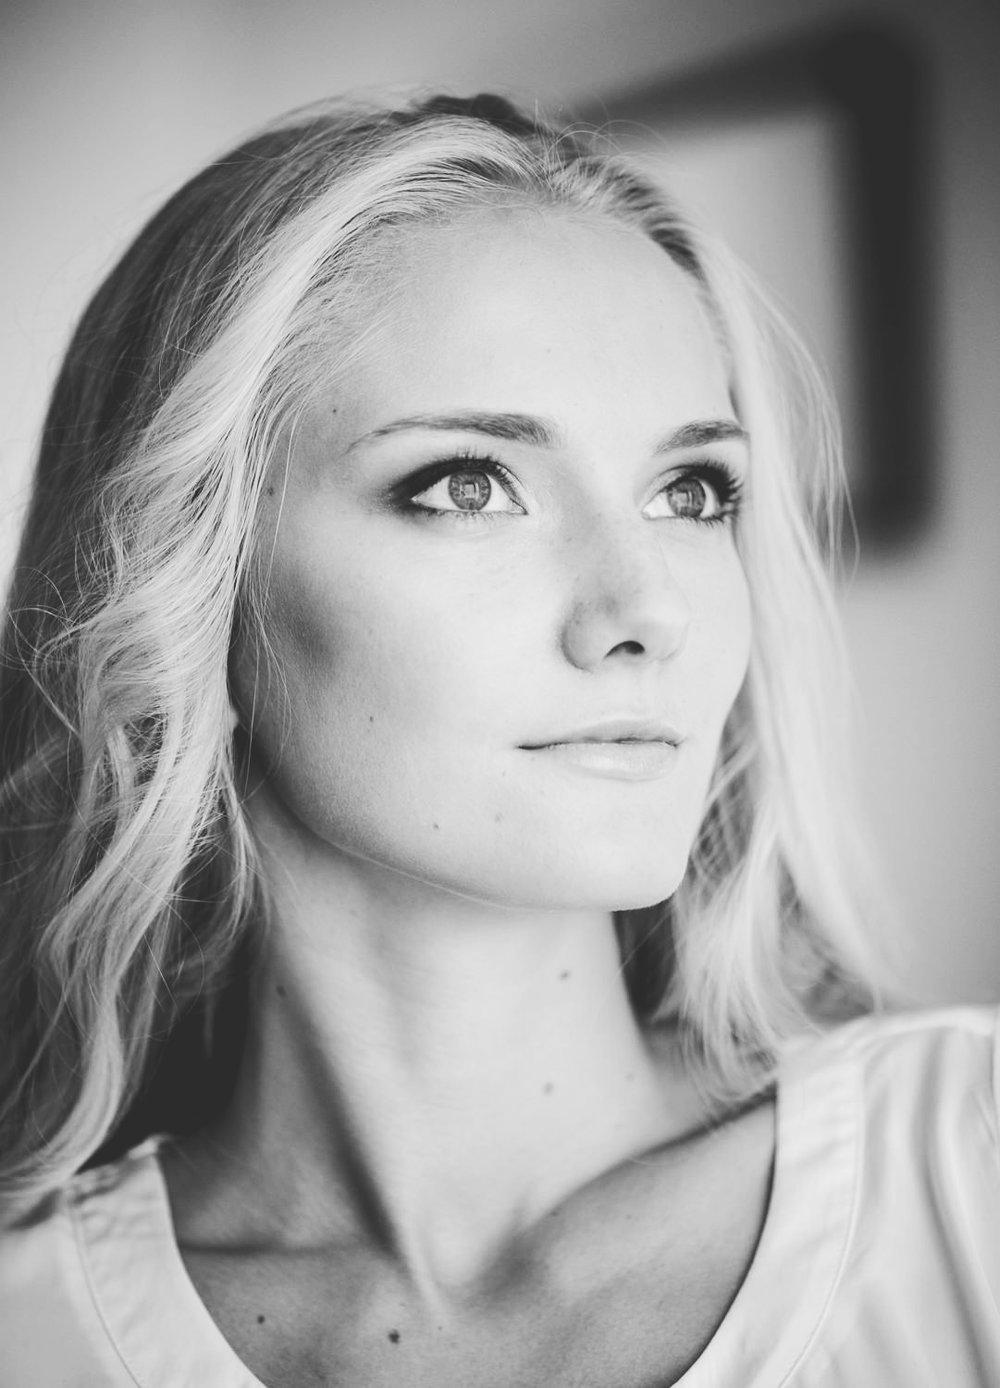 © Макс Субботин, модель Мария Чиркова